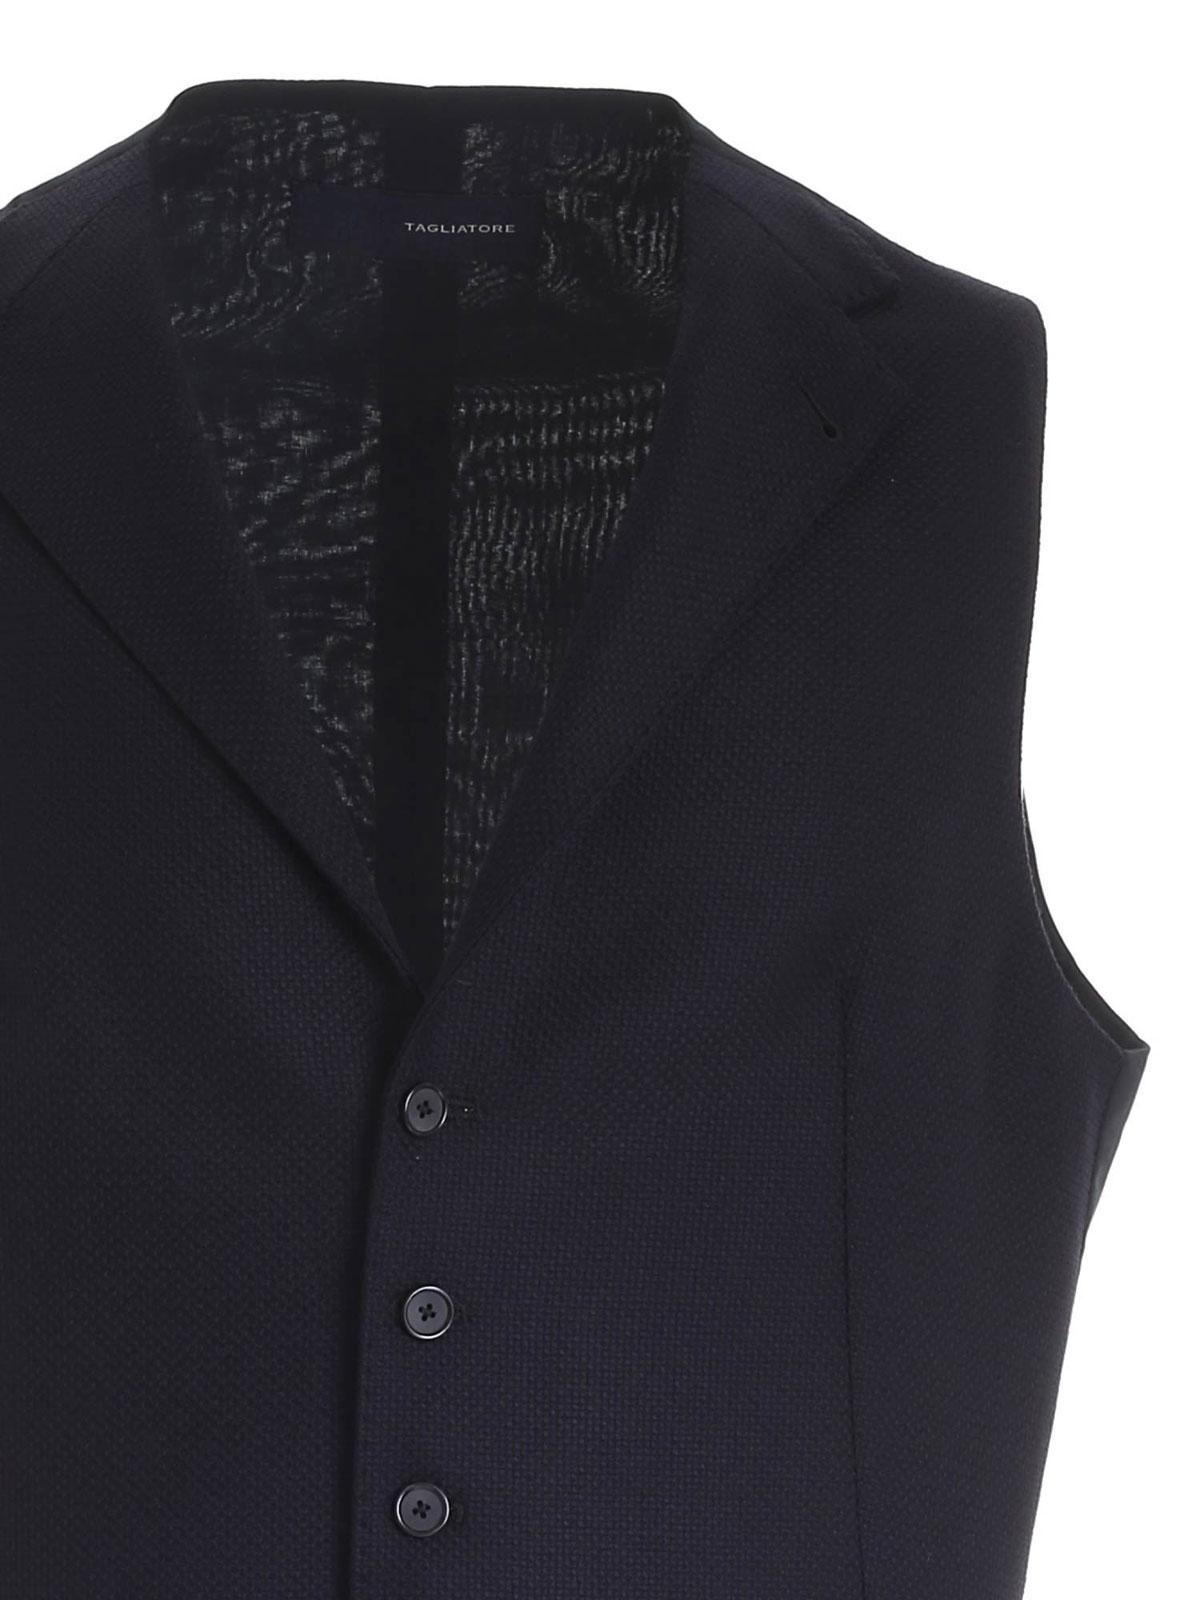 Picture of TAGLIATORE | Men's Virgin Wool Vest